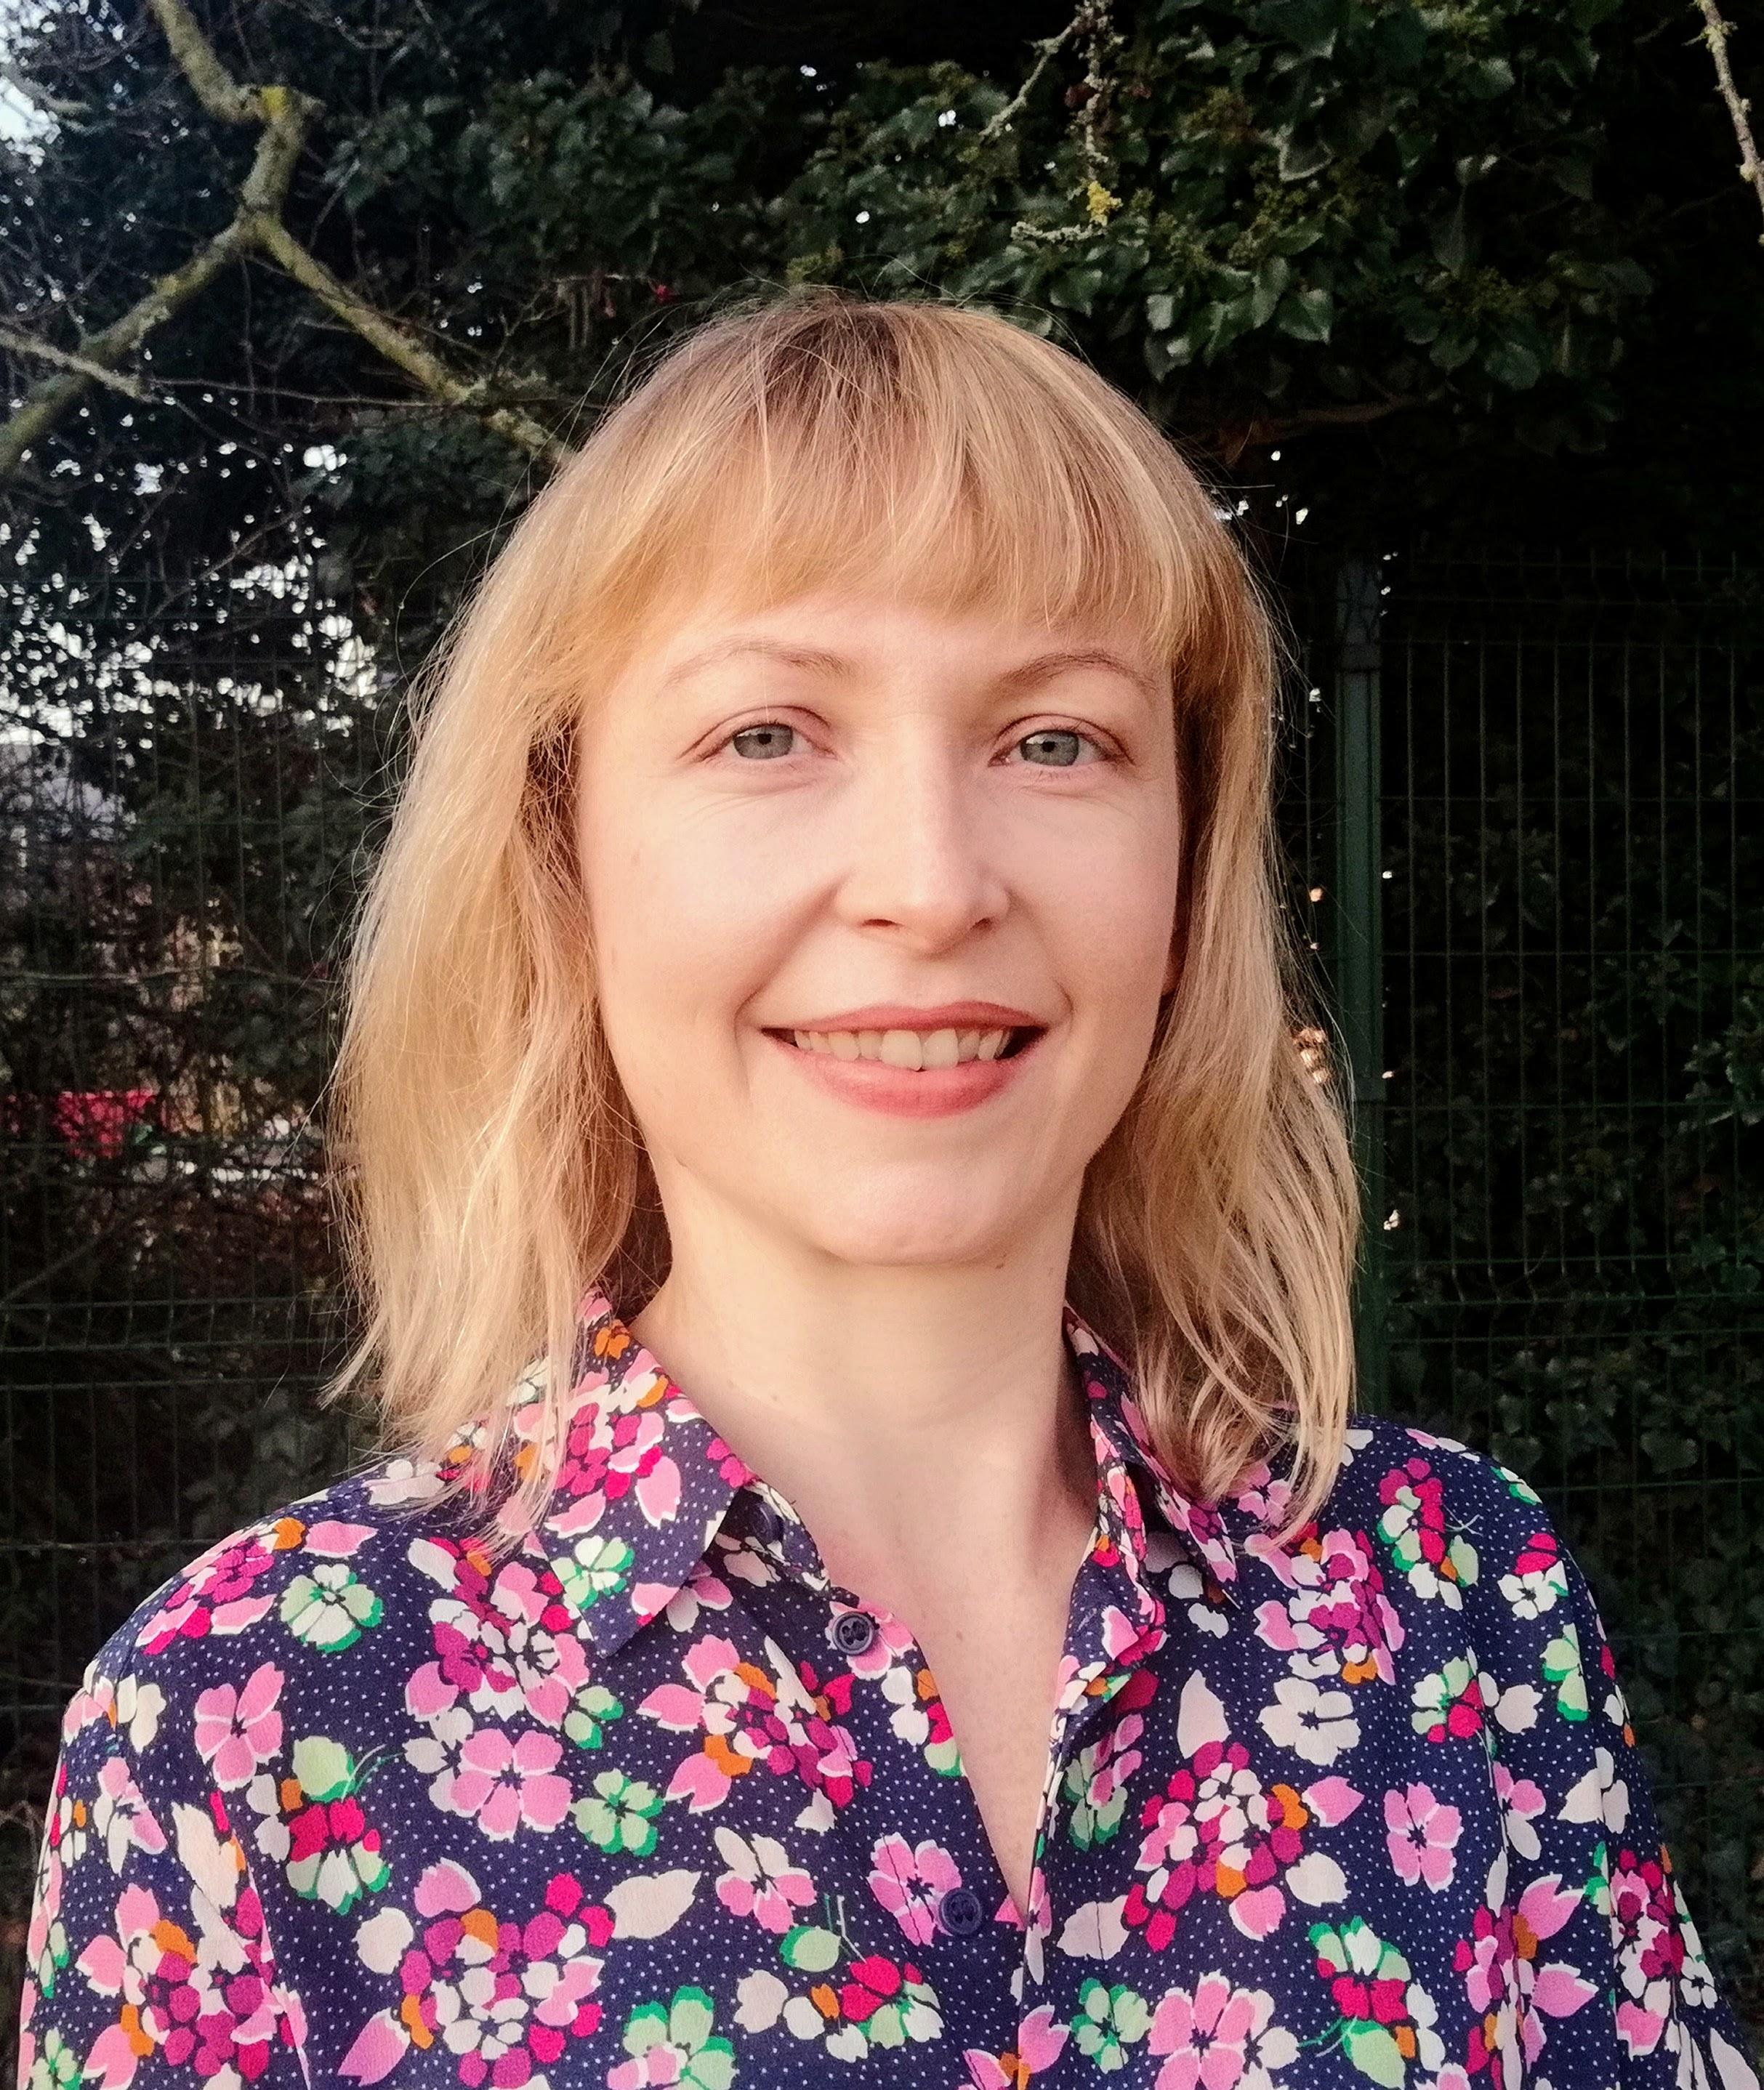 Emma Gorman